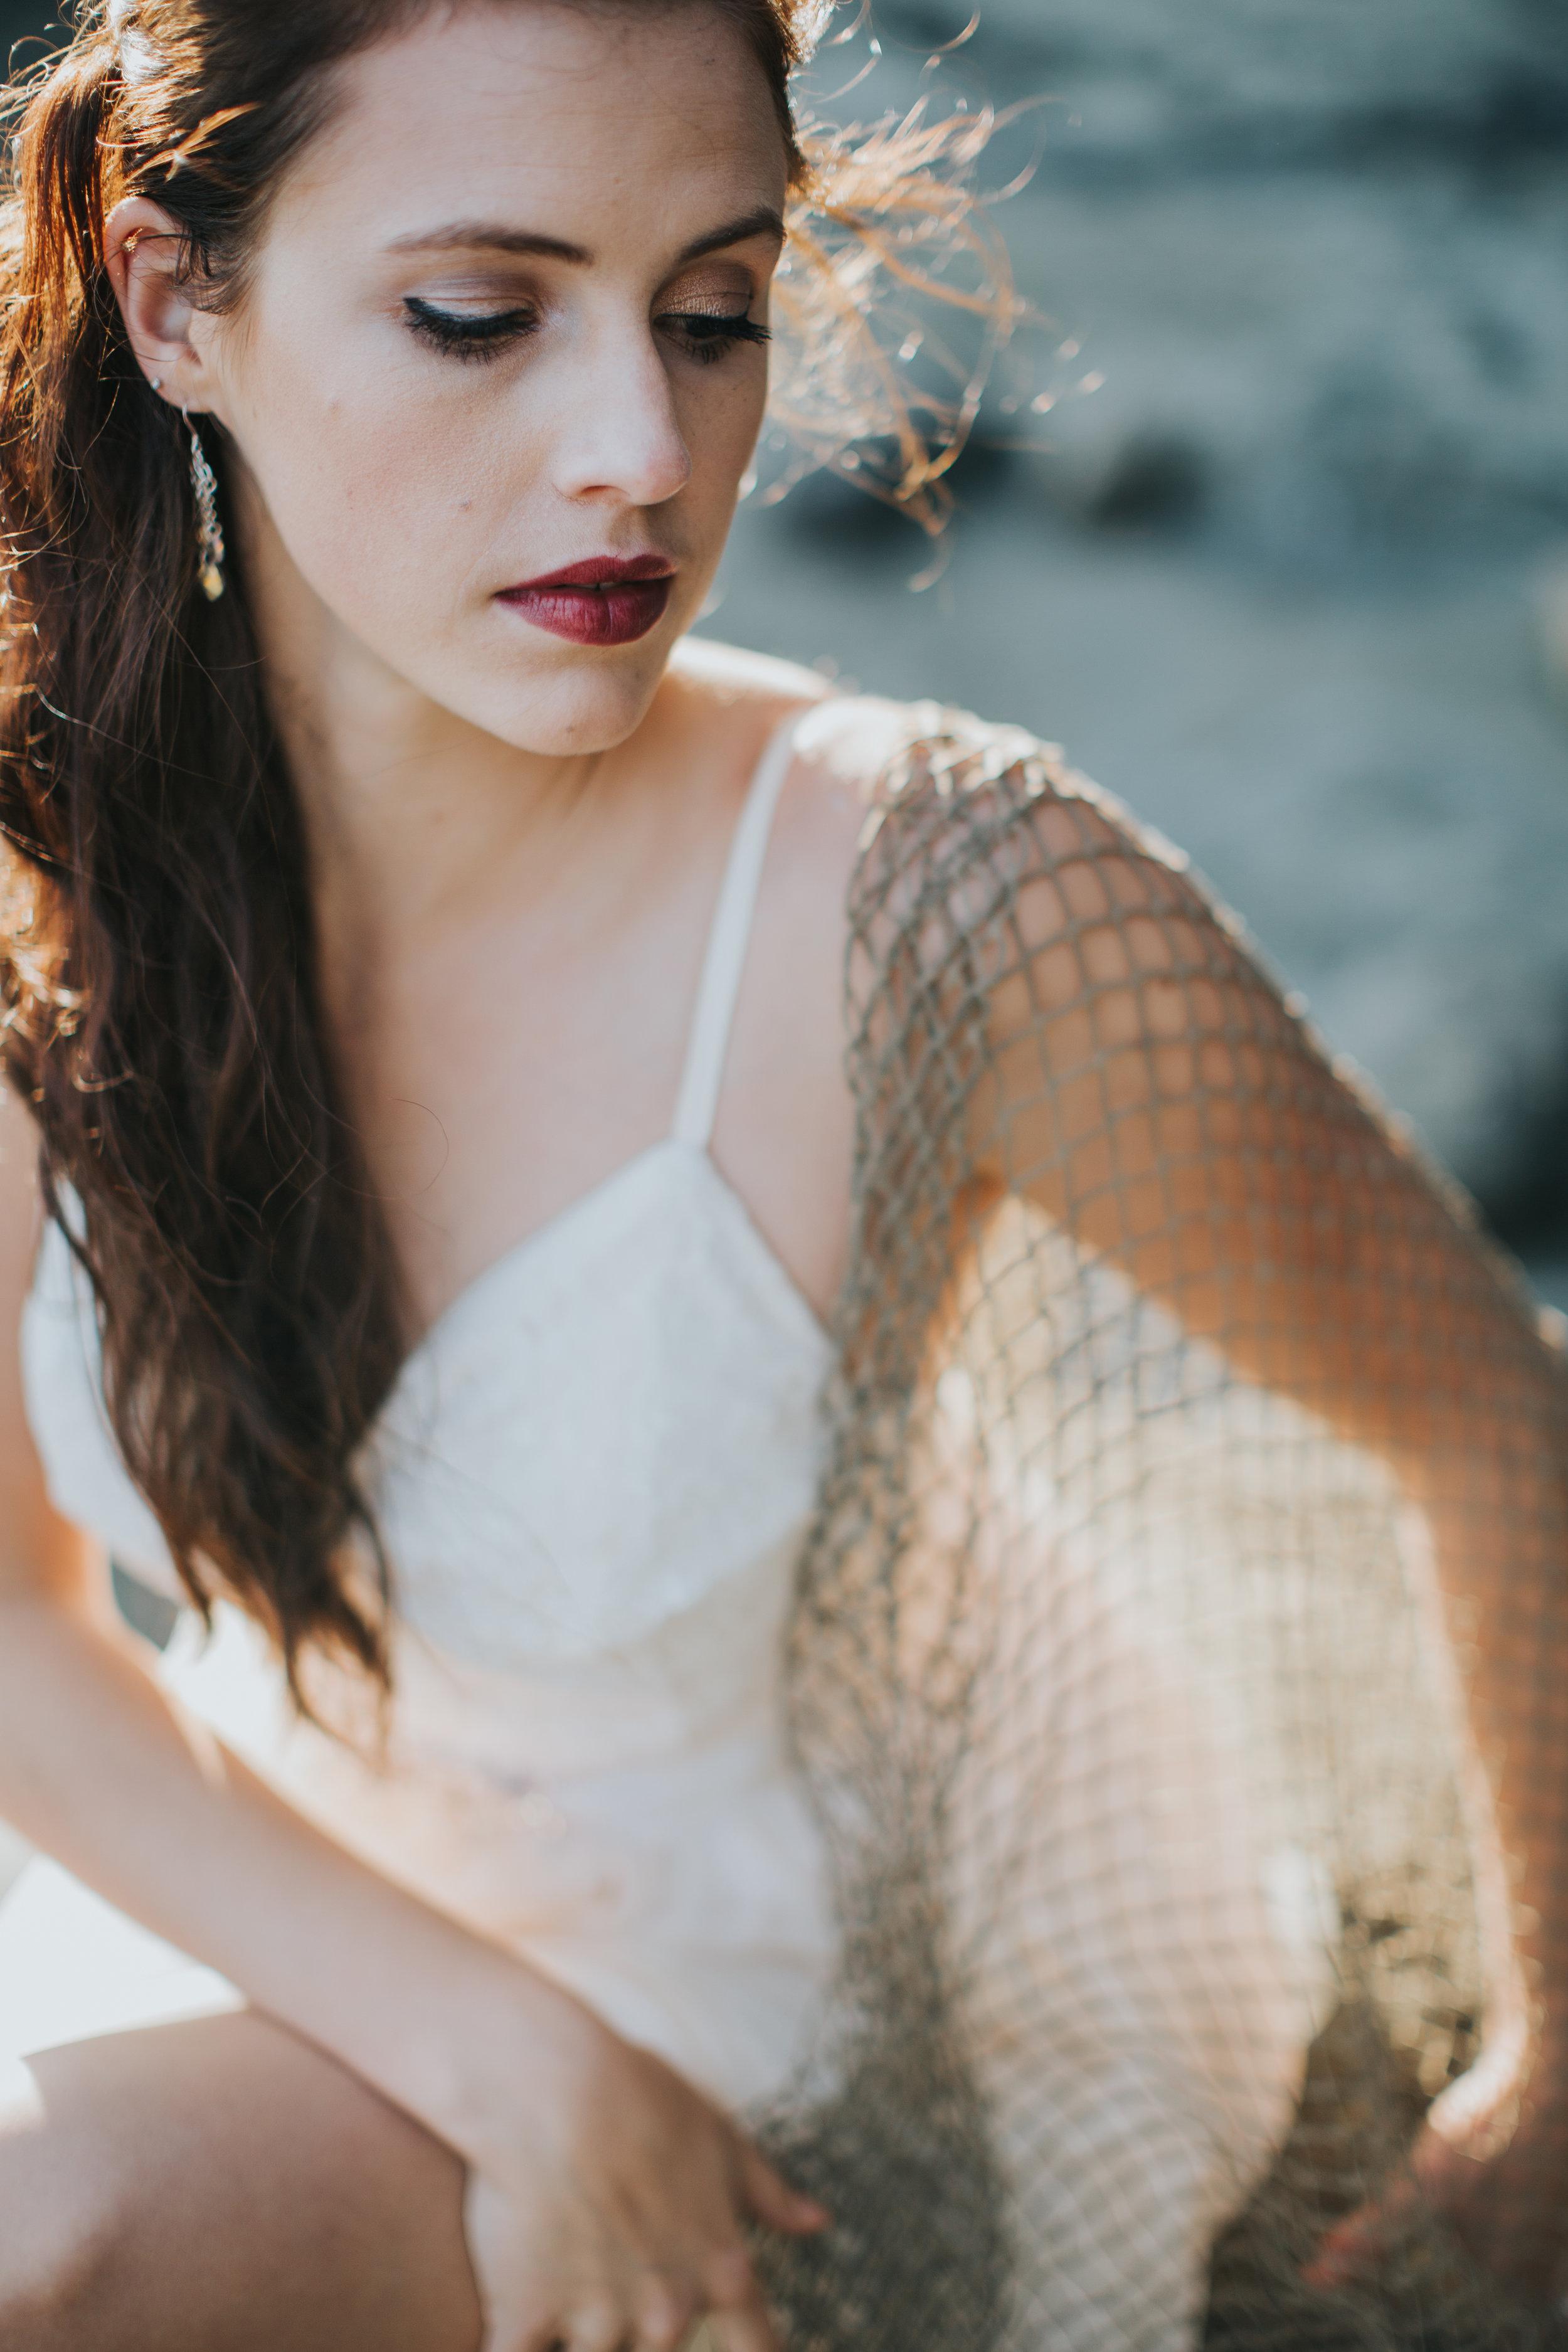 Port-Angeles-Salt-Creek-beach-wedding-bride-PNW-olympic-peninsula-photographer-Kayla-Dawn-Photography-outdoors-golden-hour-dancer-dress (29).jpg